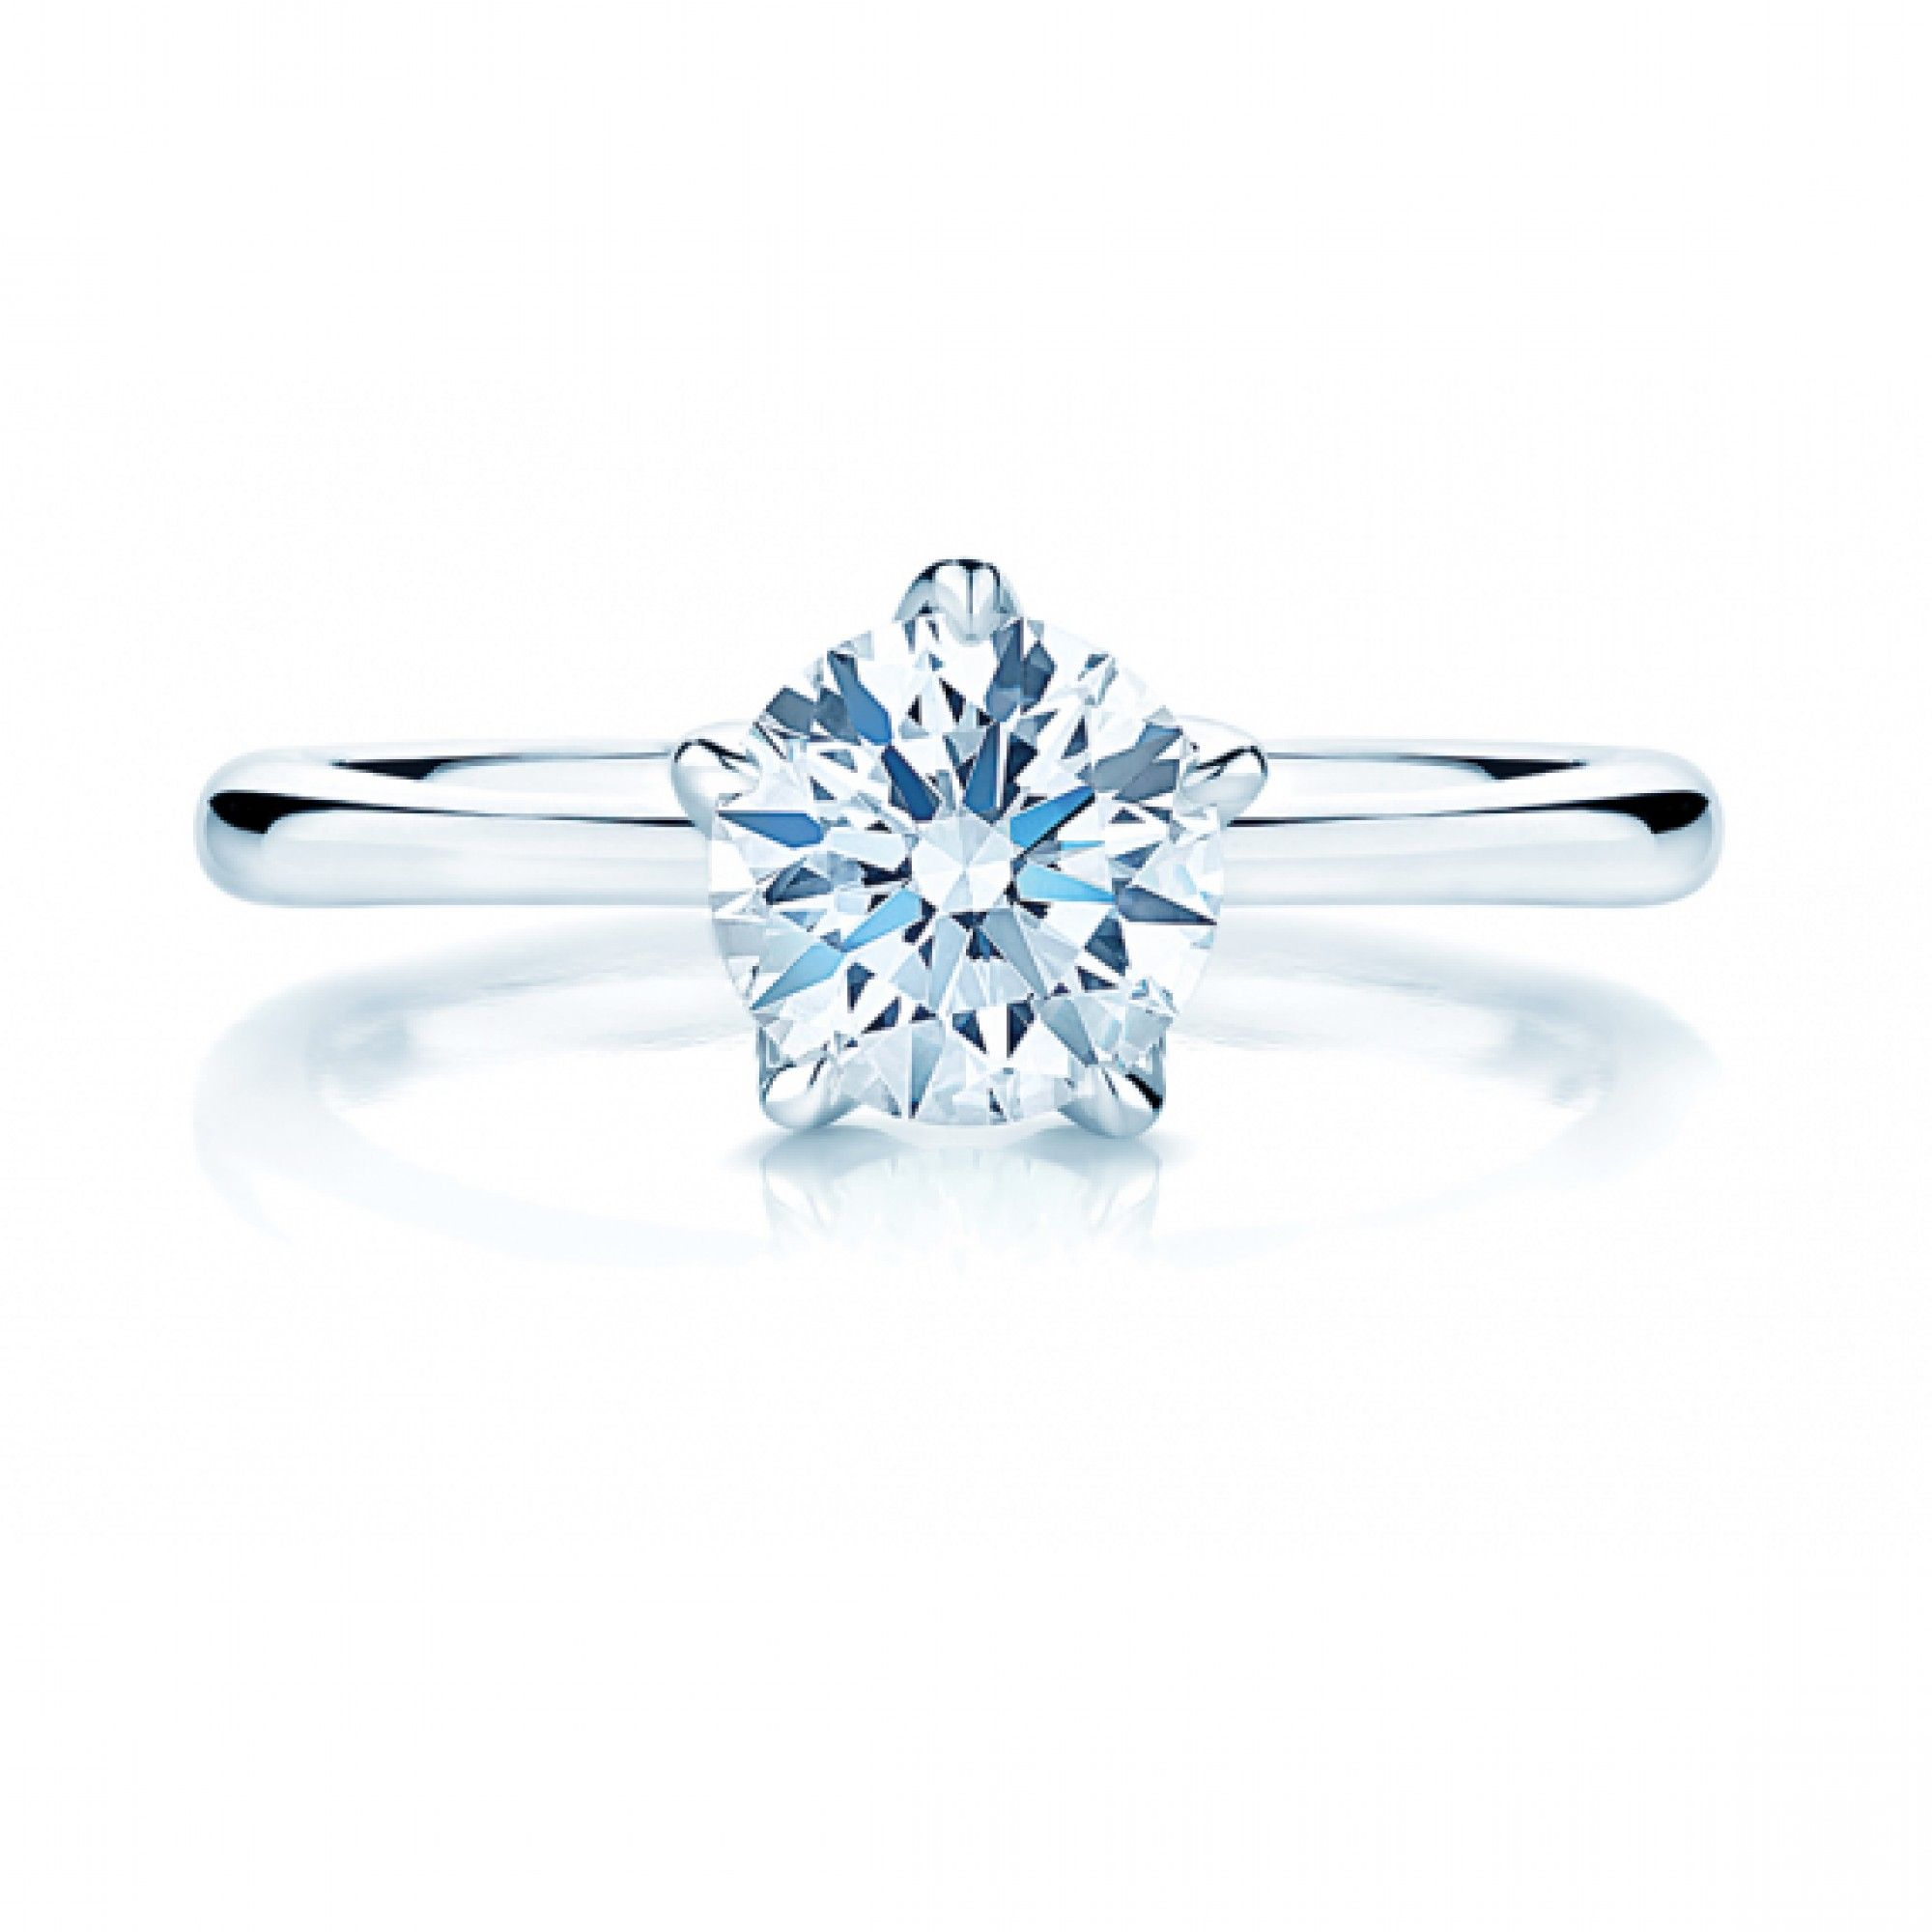 Birks North Star™ Platinum Diamond Engagement Ring engagemnet